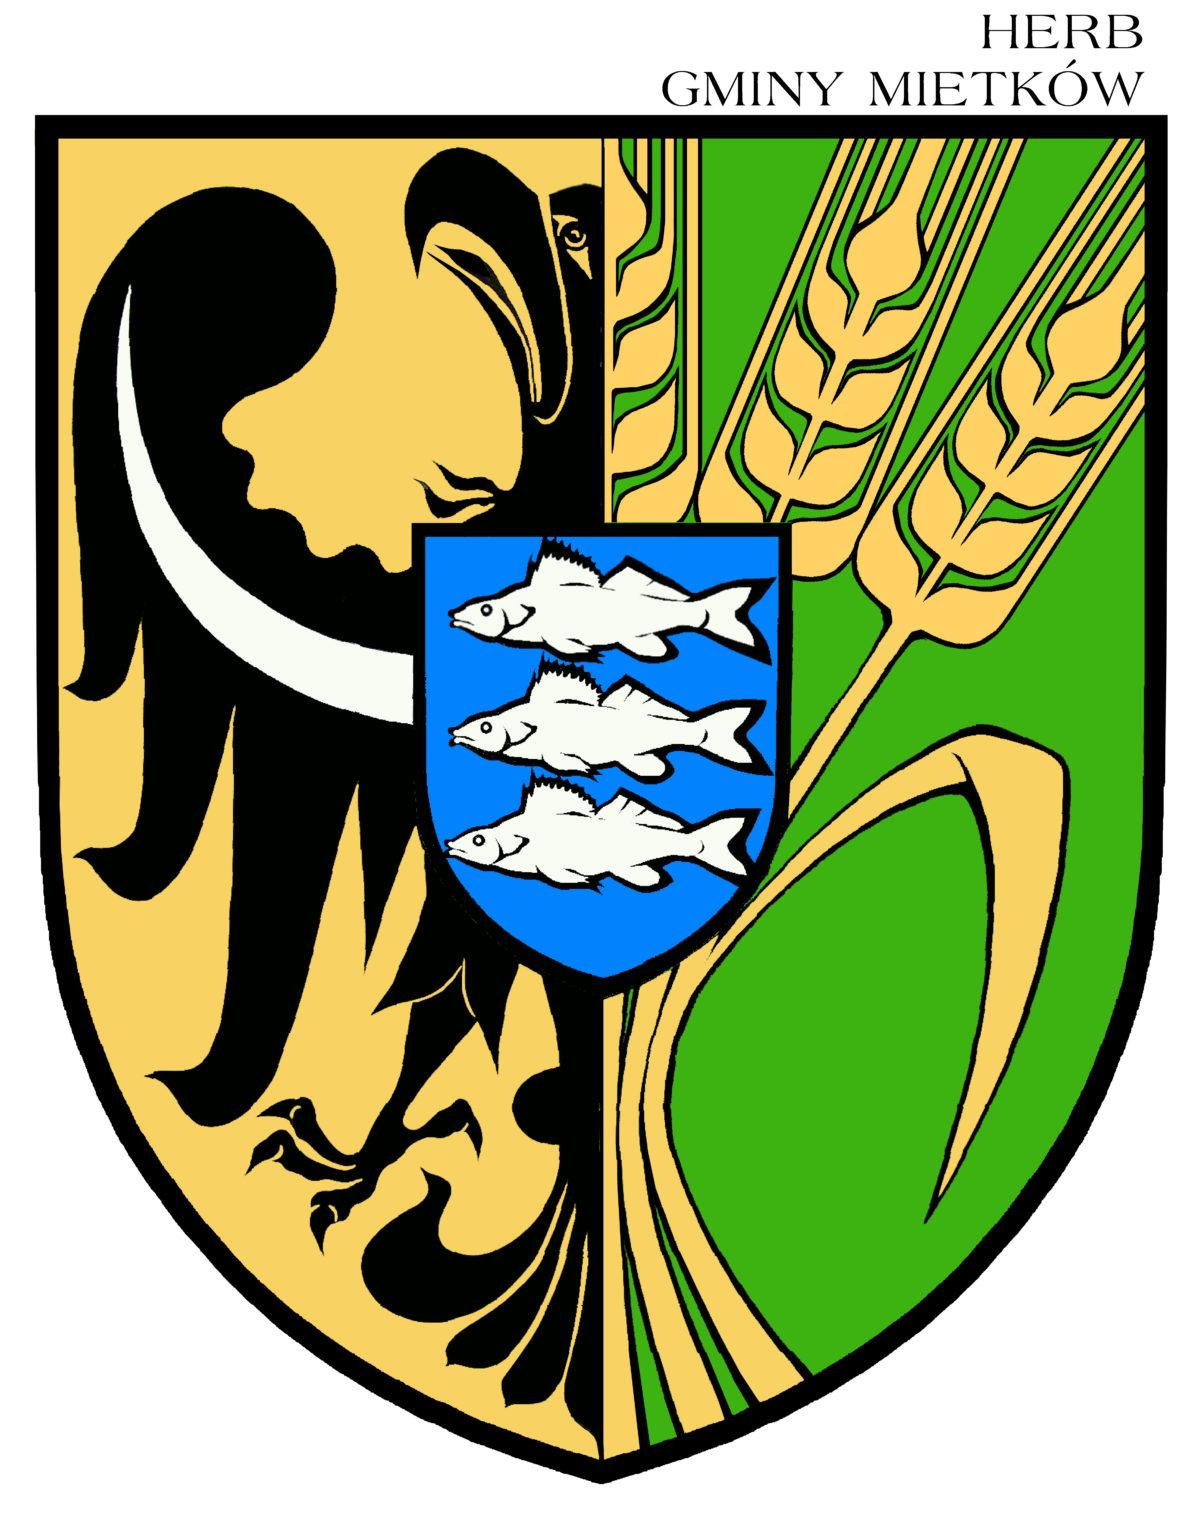 Herb Gminy Mietków